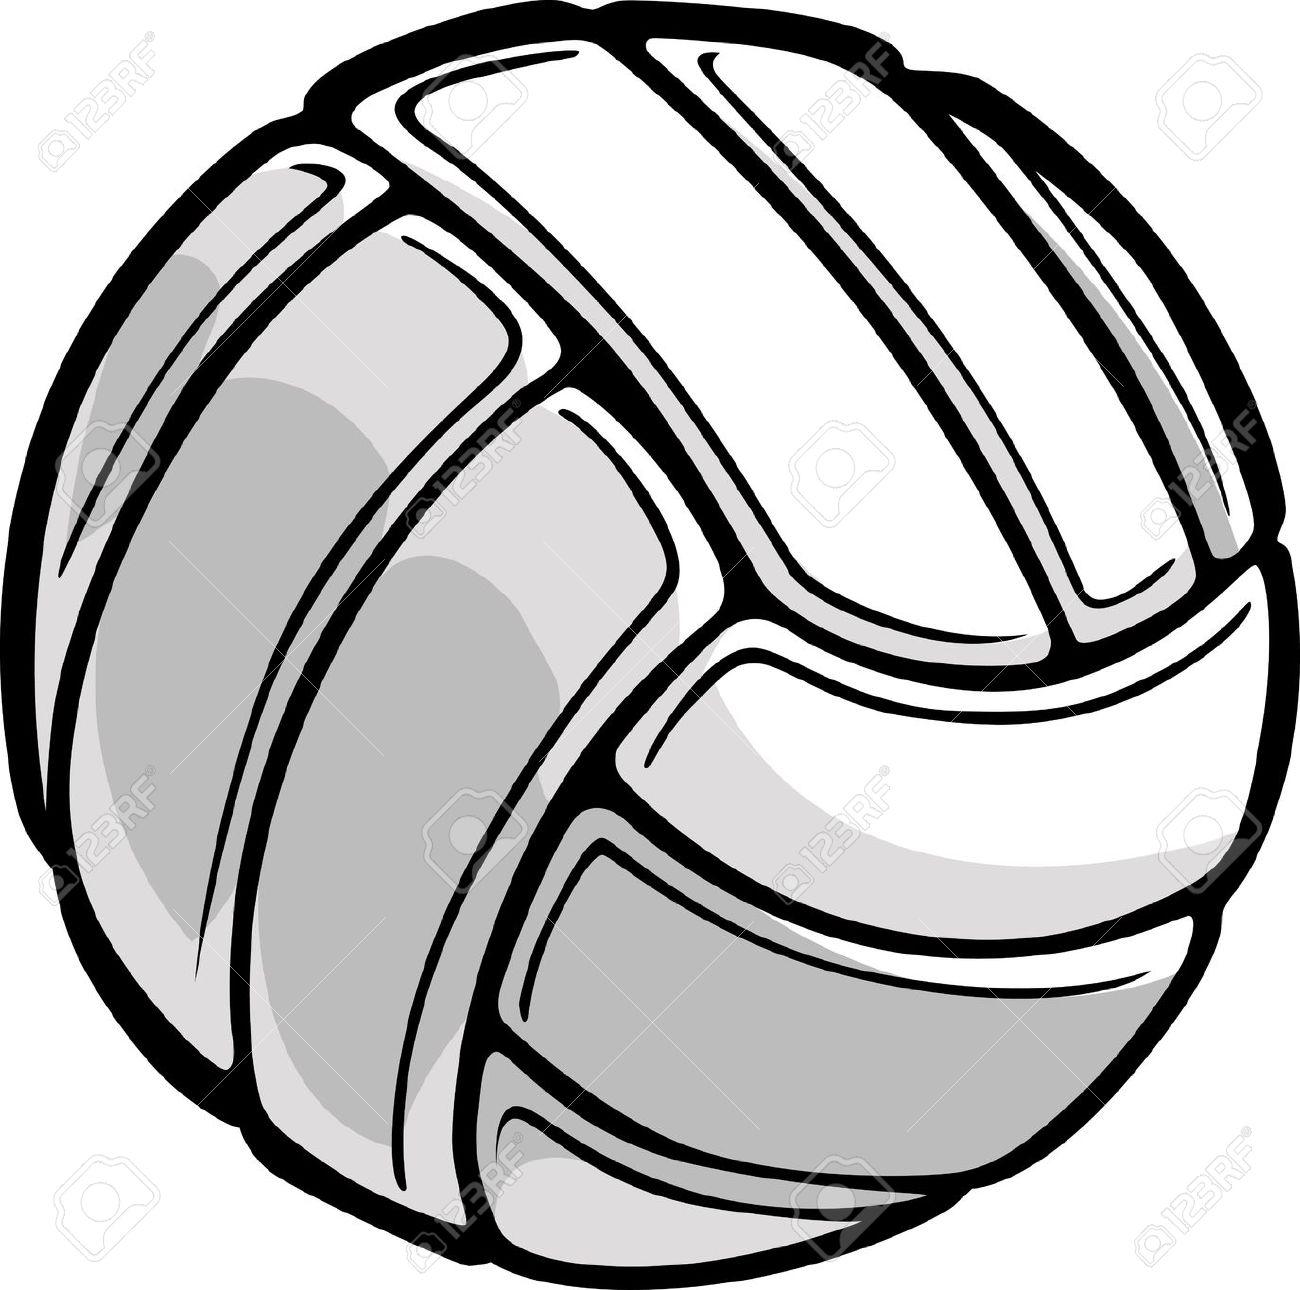 Kit clipartbarn . Volleyball clipart clip art